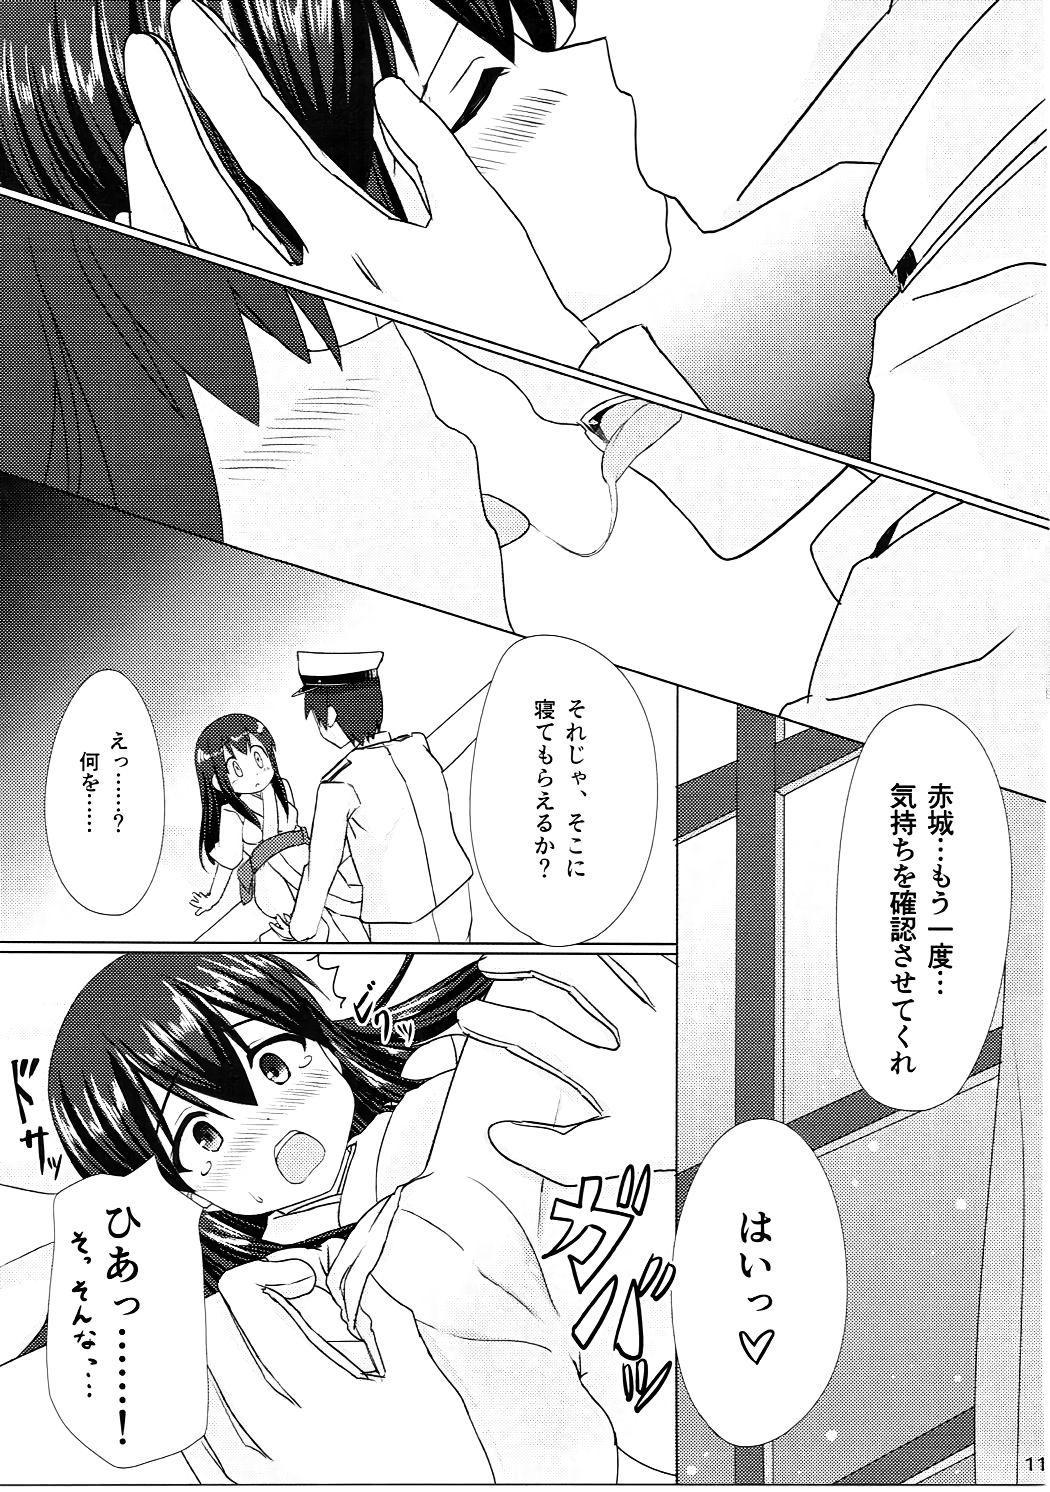 Akagi-san to Kekkon Kakko Kari 9